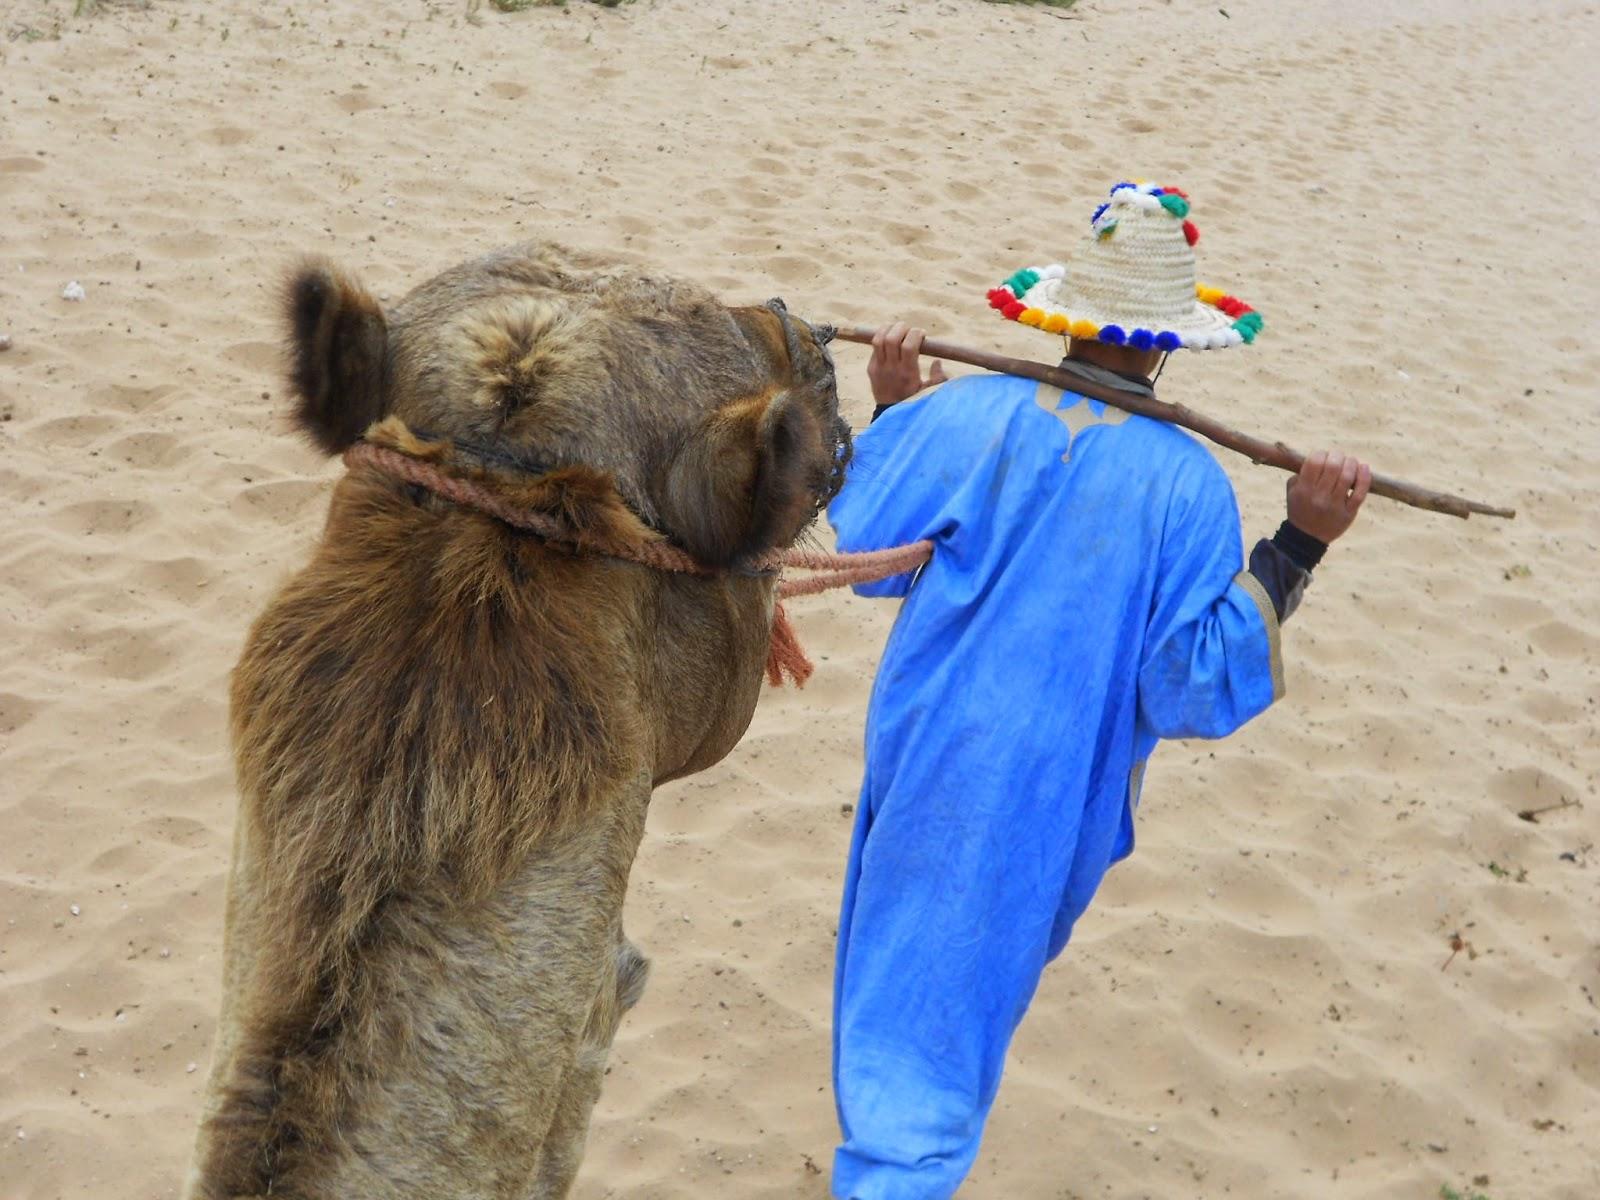 Agadir - Maroc - Morocco - Dromadaire